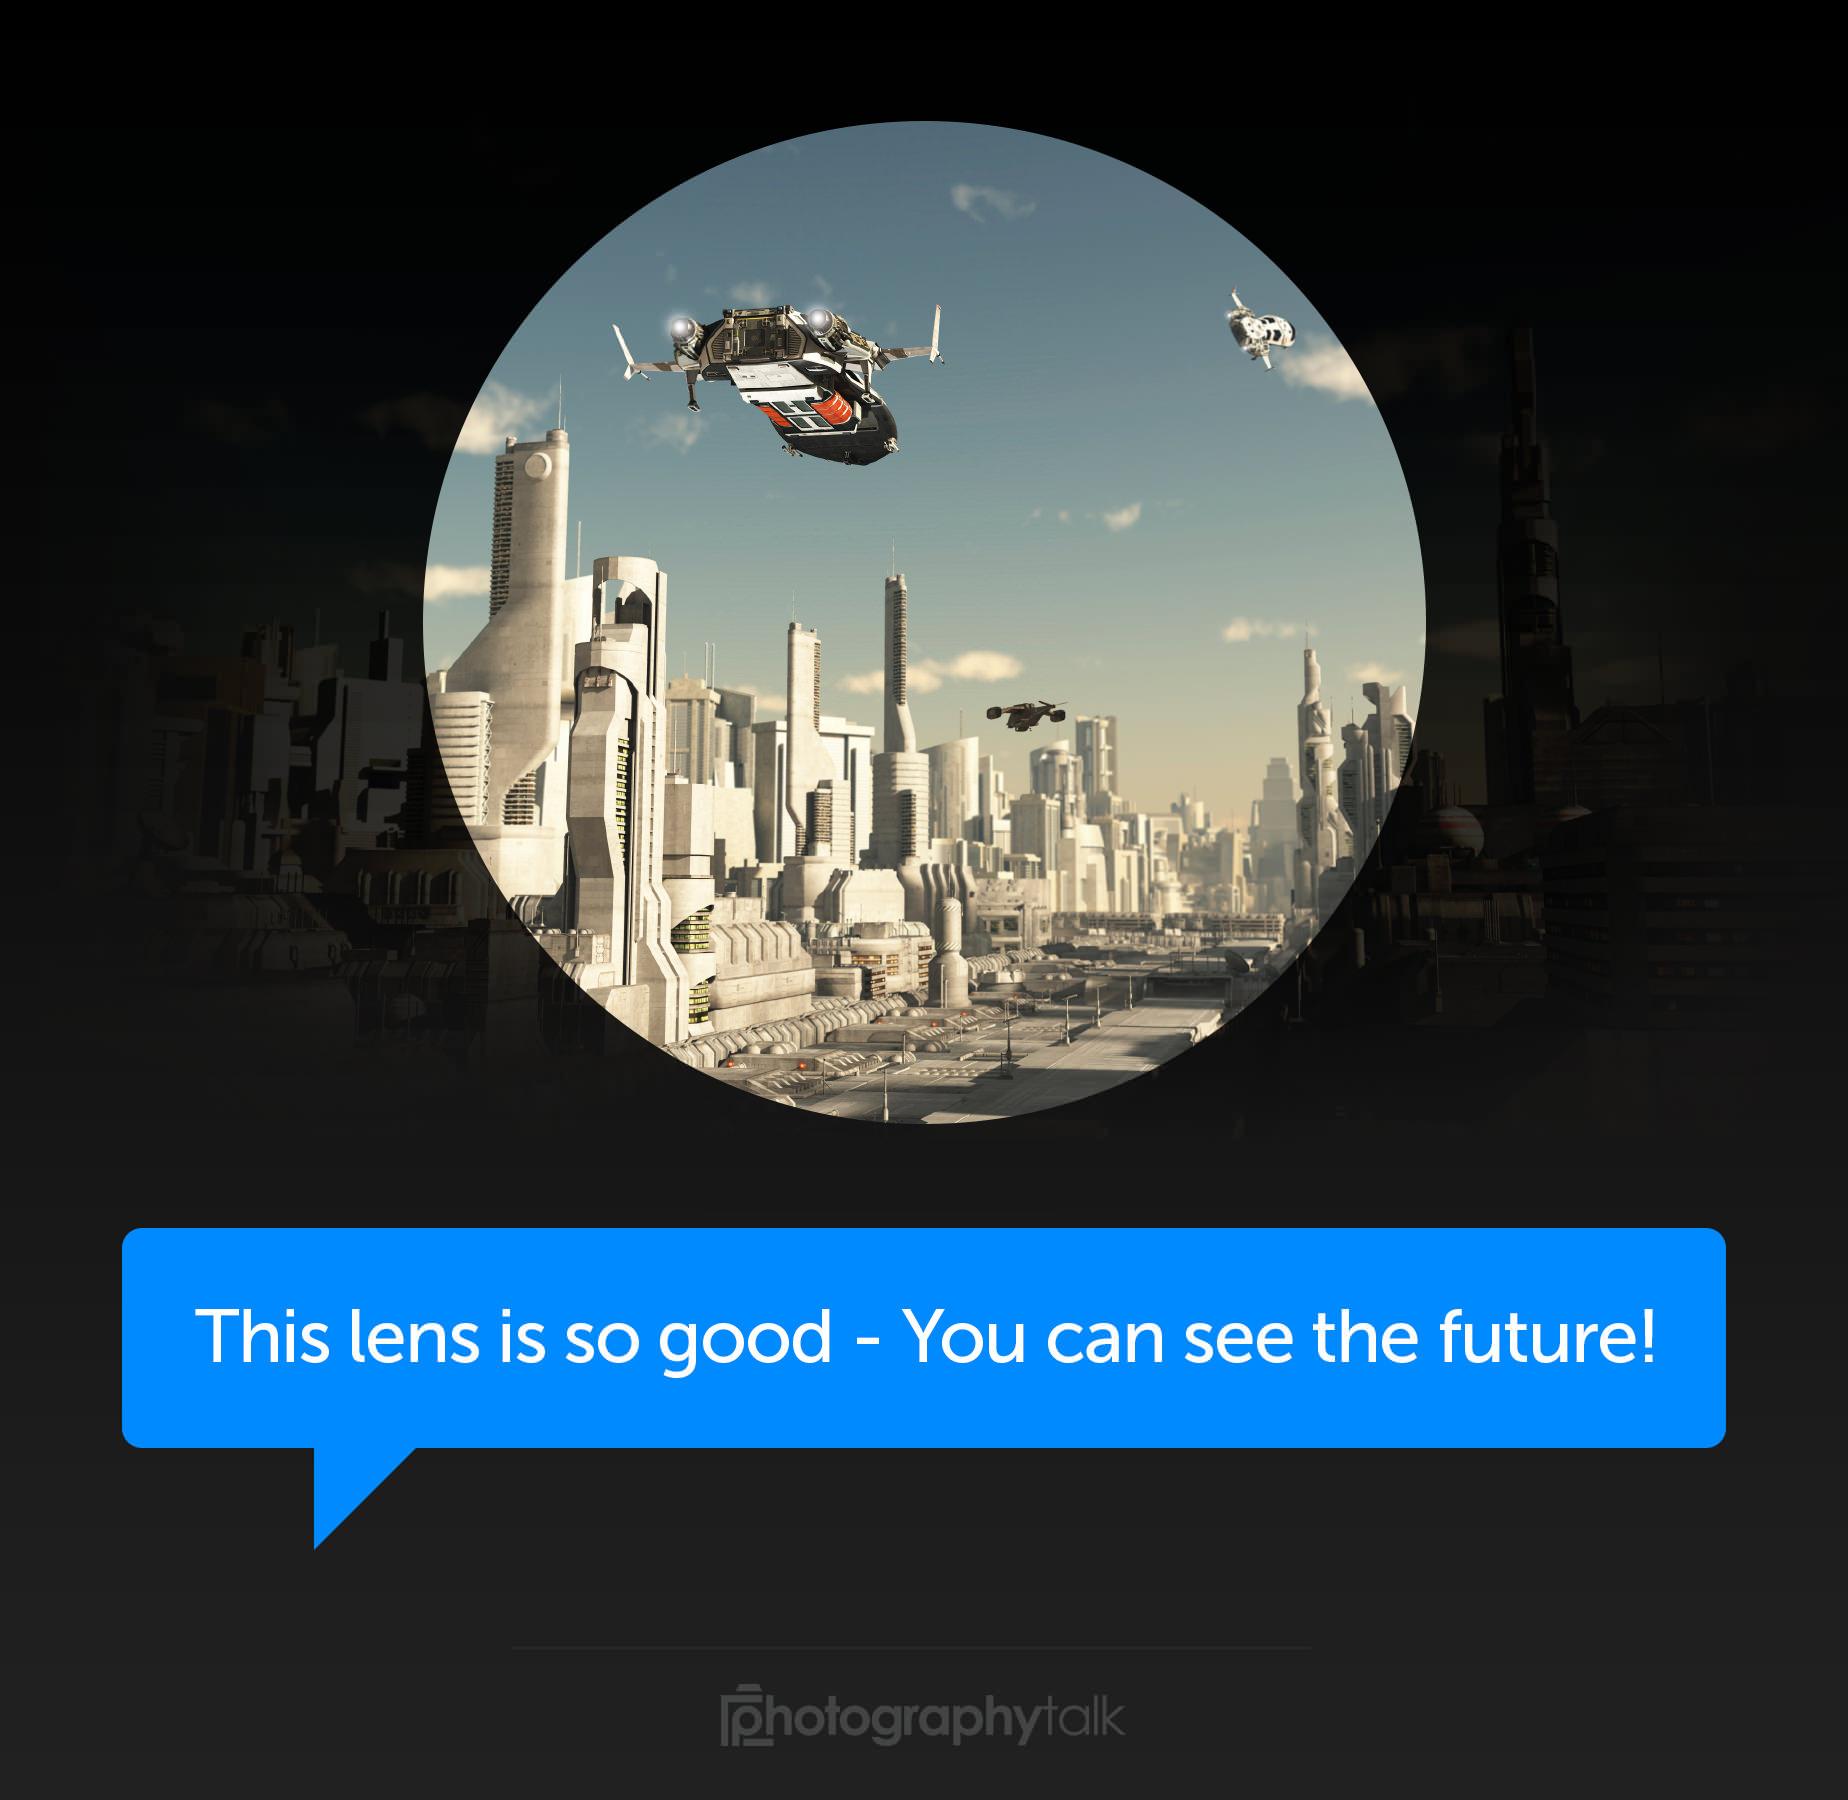 future lens image